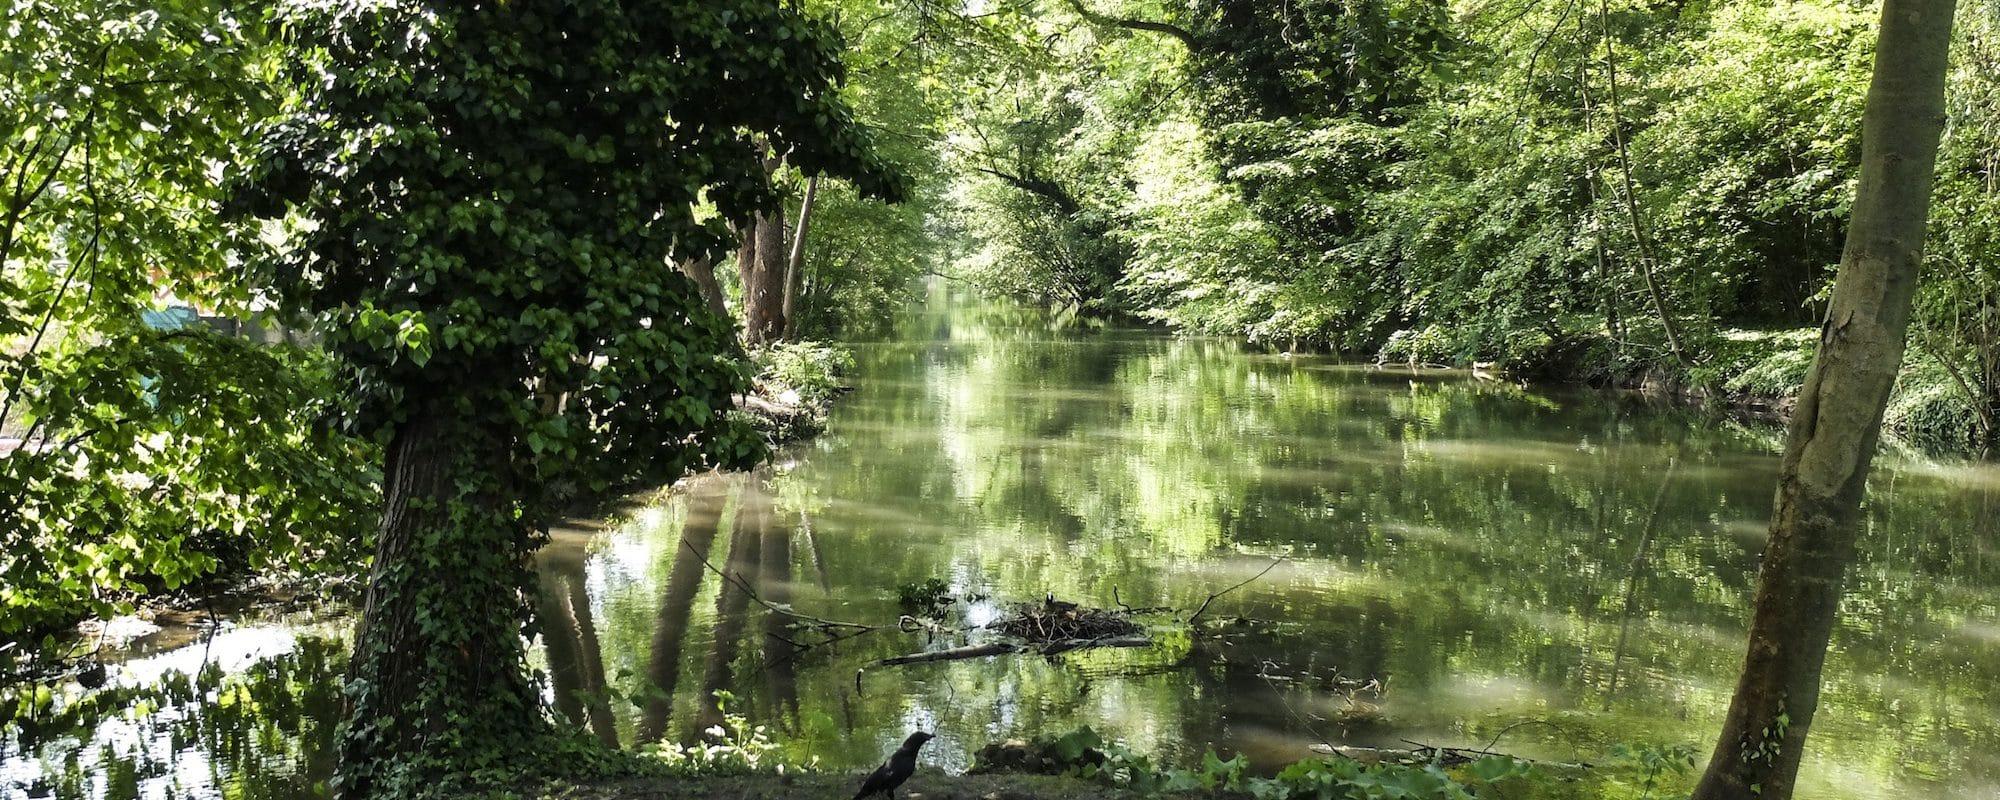 Balade nature : de Neudorf au Baggersee, en suivant le Ziegelwasser